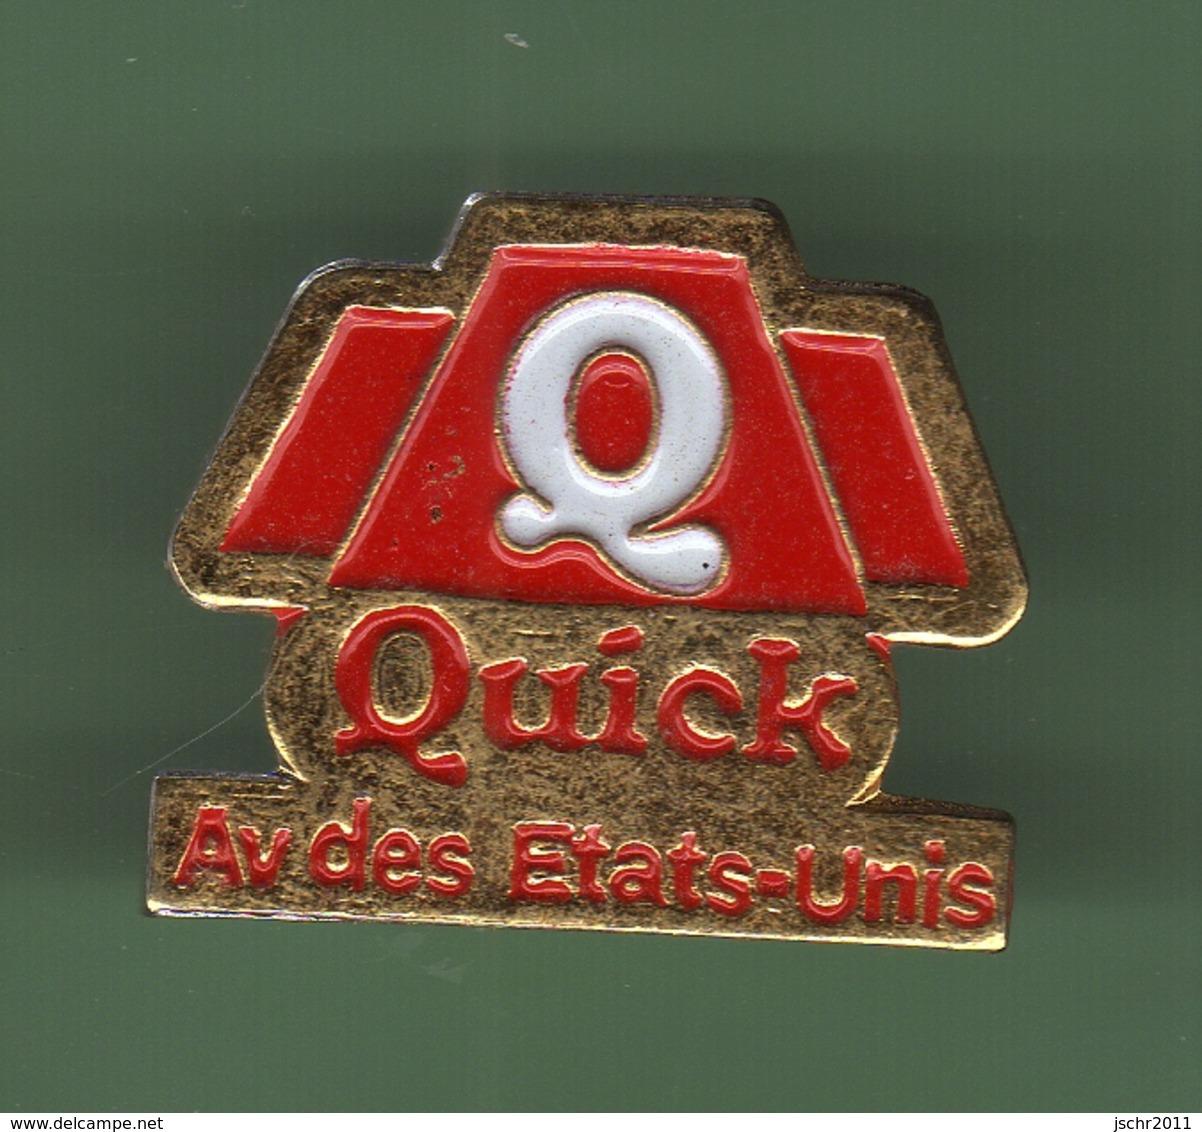 QUICK *** AVENUE DES ETATS-UNIS *** 0019 - McDonald's